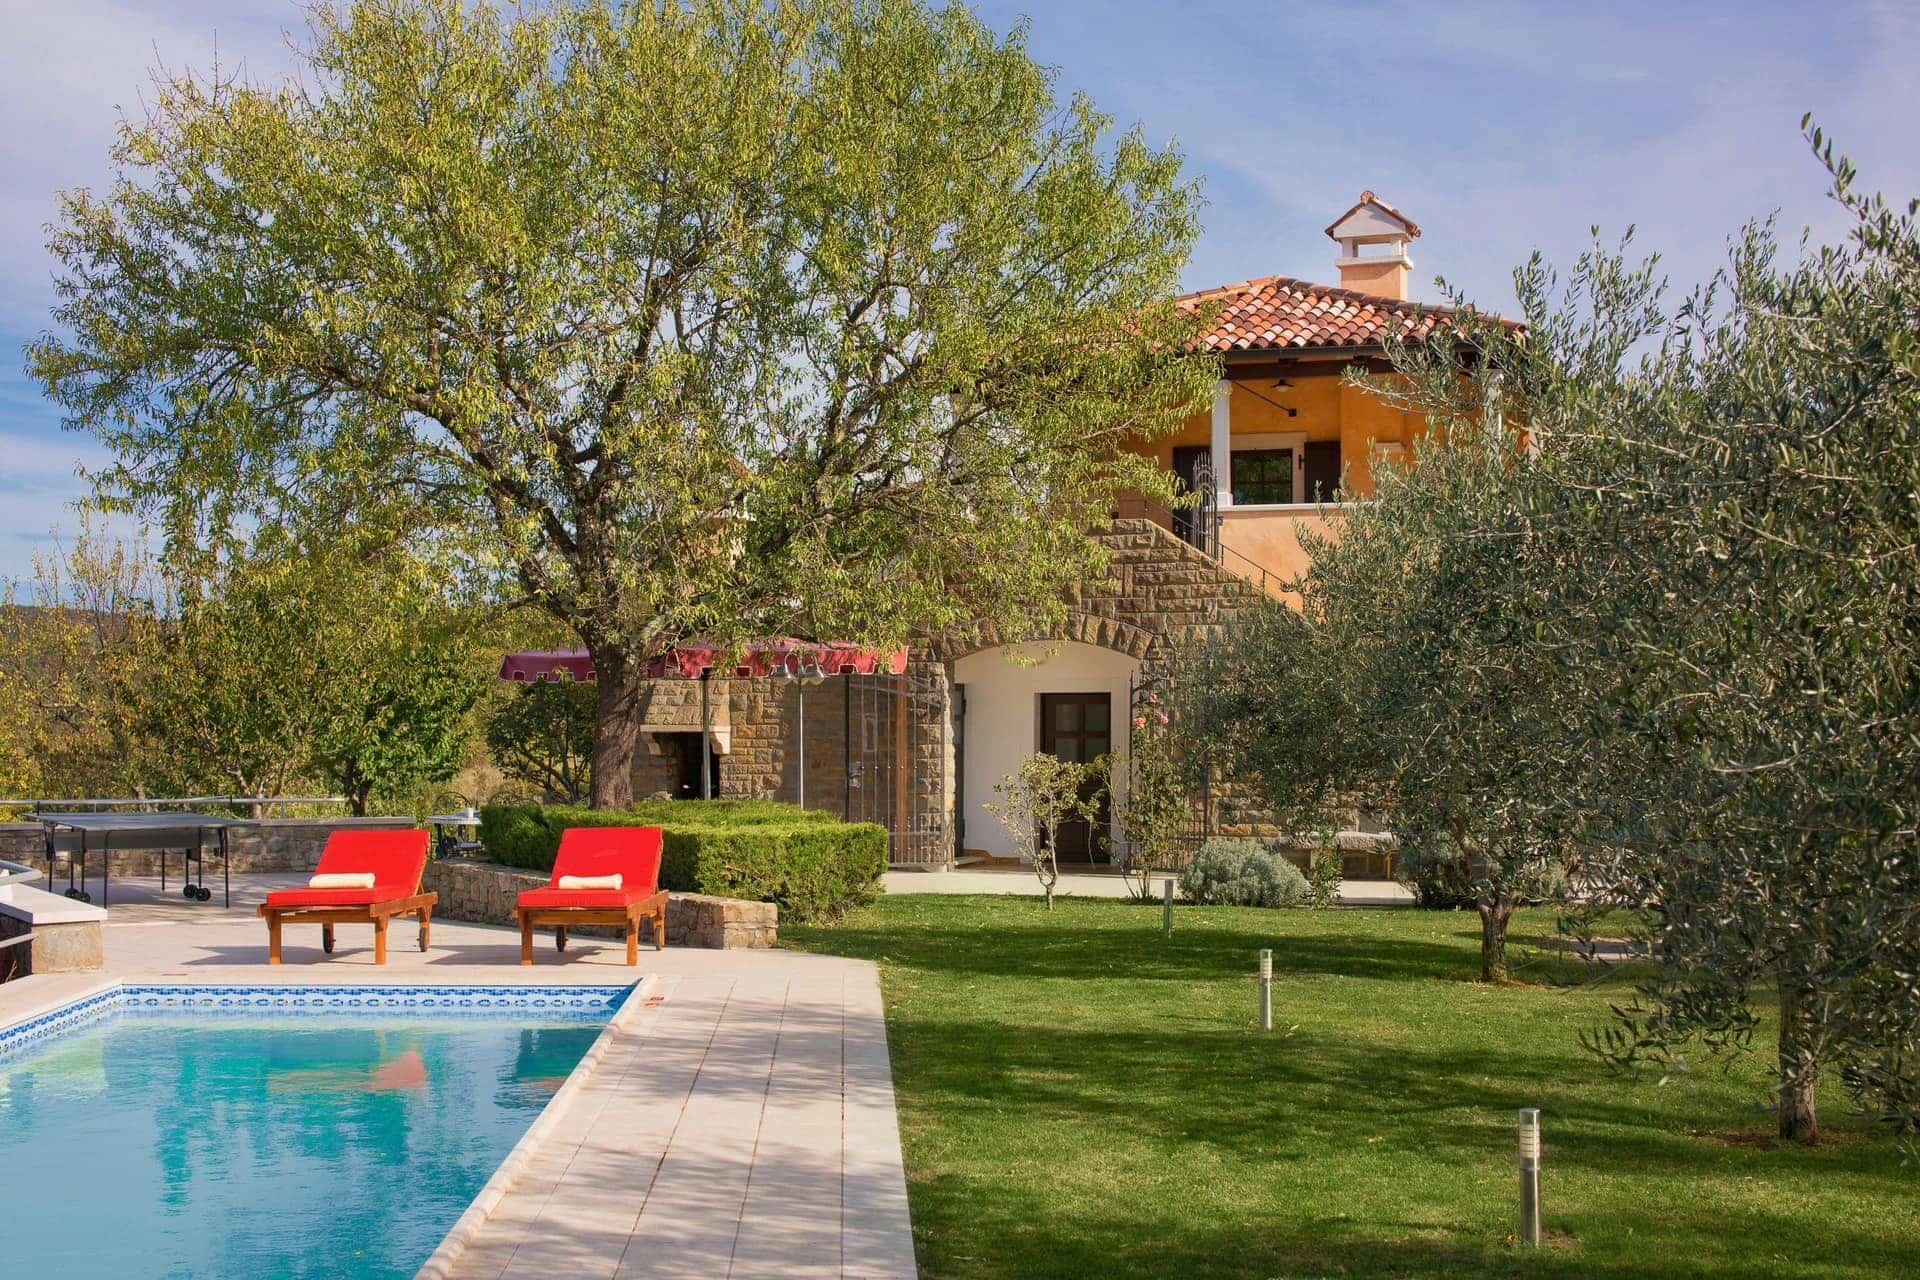 Swimming pool and garden at Villa Momiano